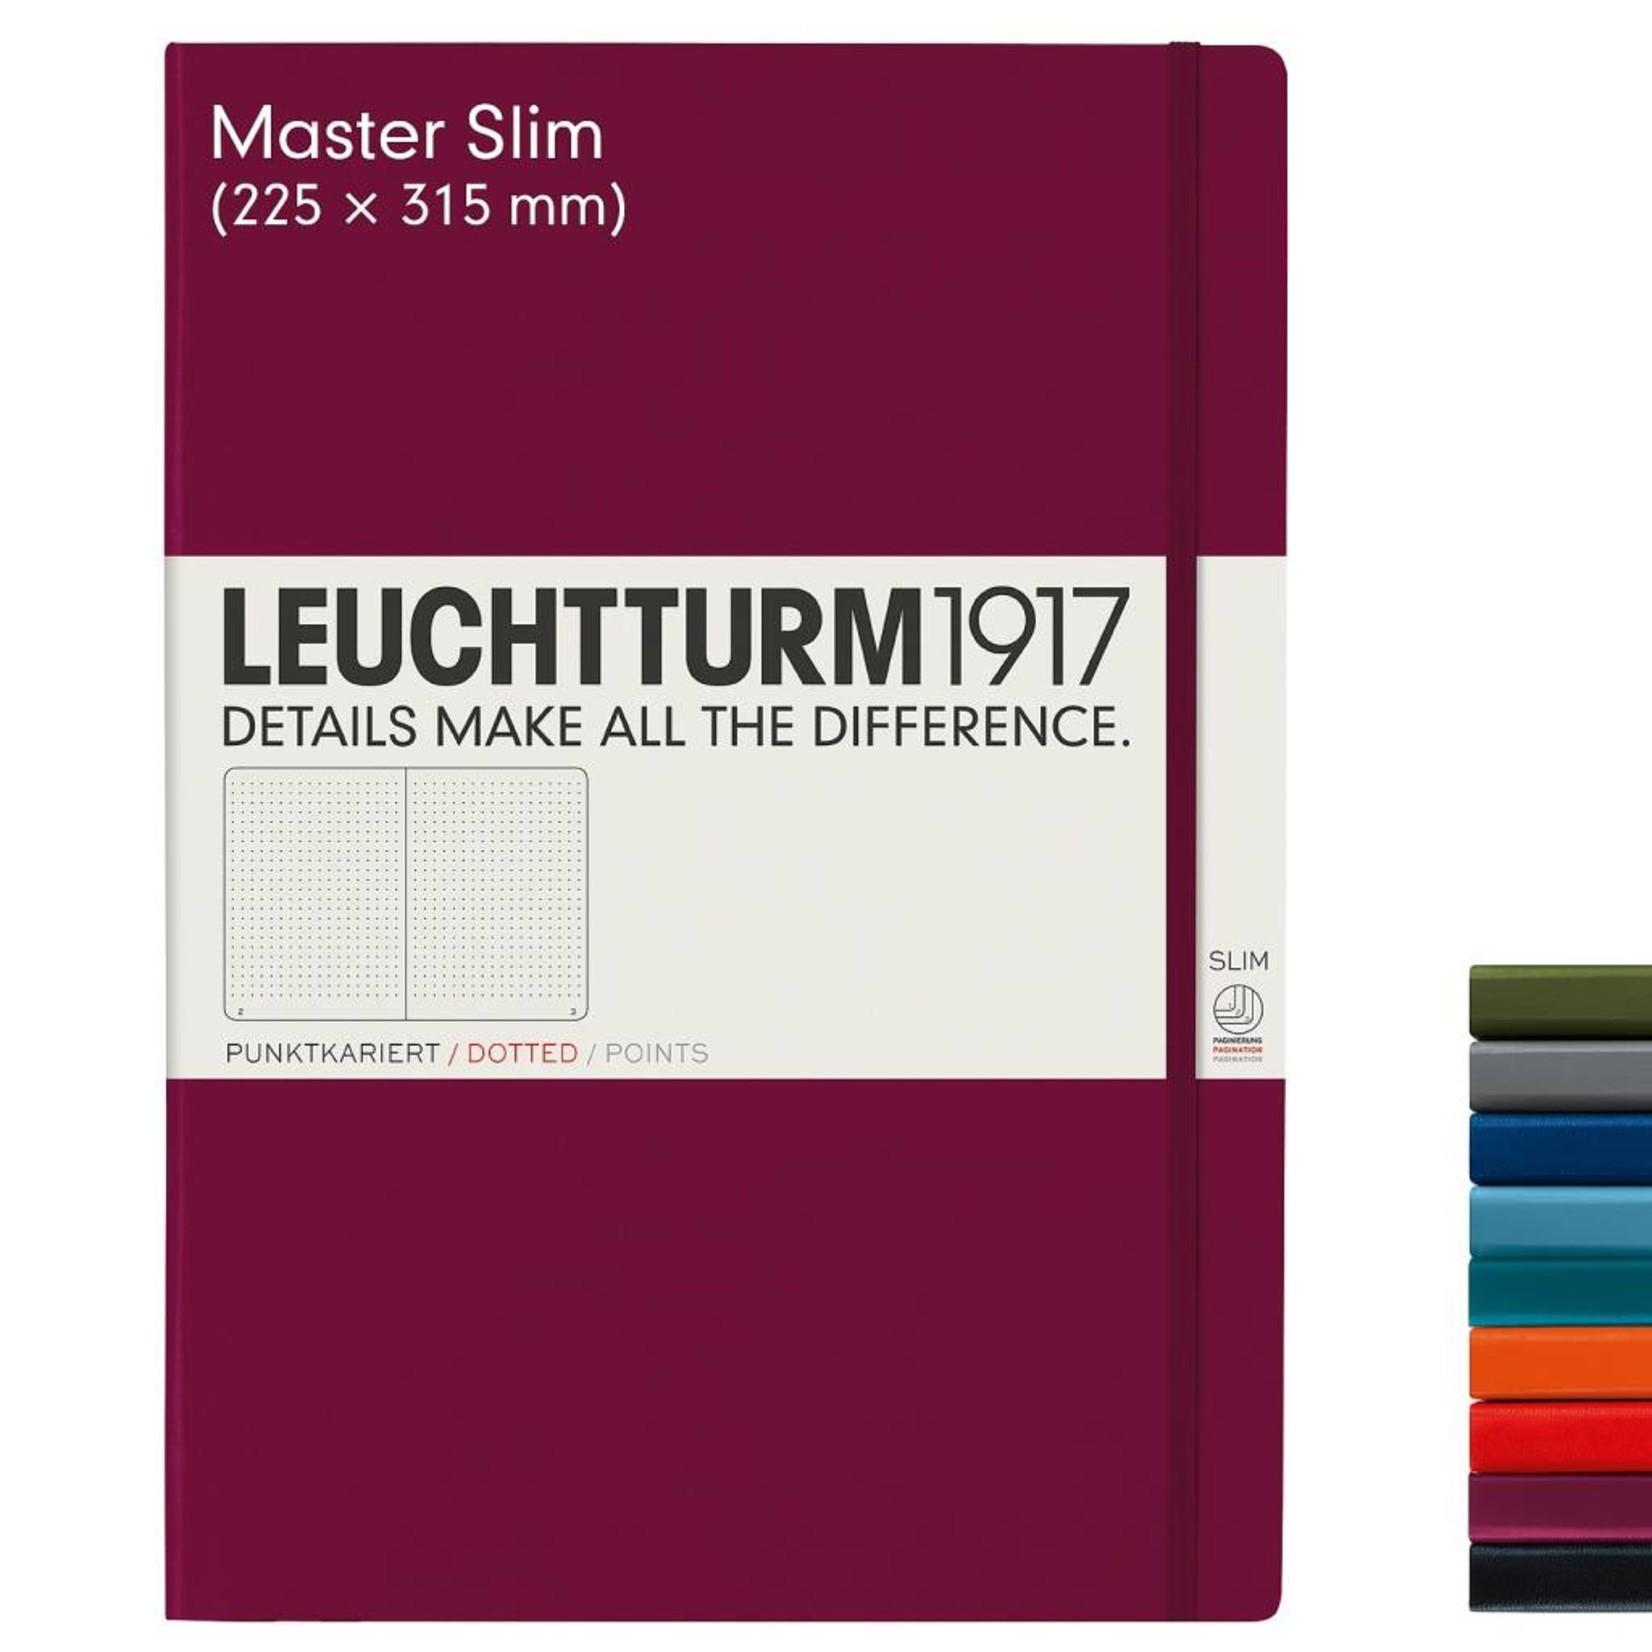 Leuchtturm1917 LT Notizbuch A4 MASTER SLIM HC port red kariert